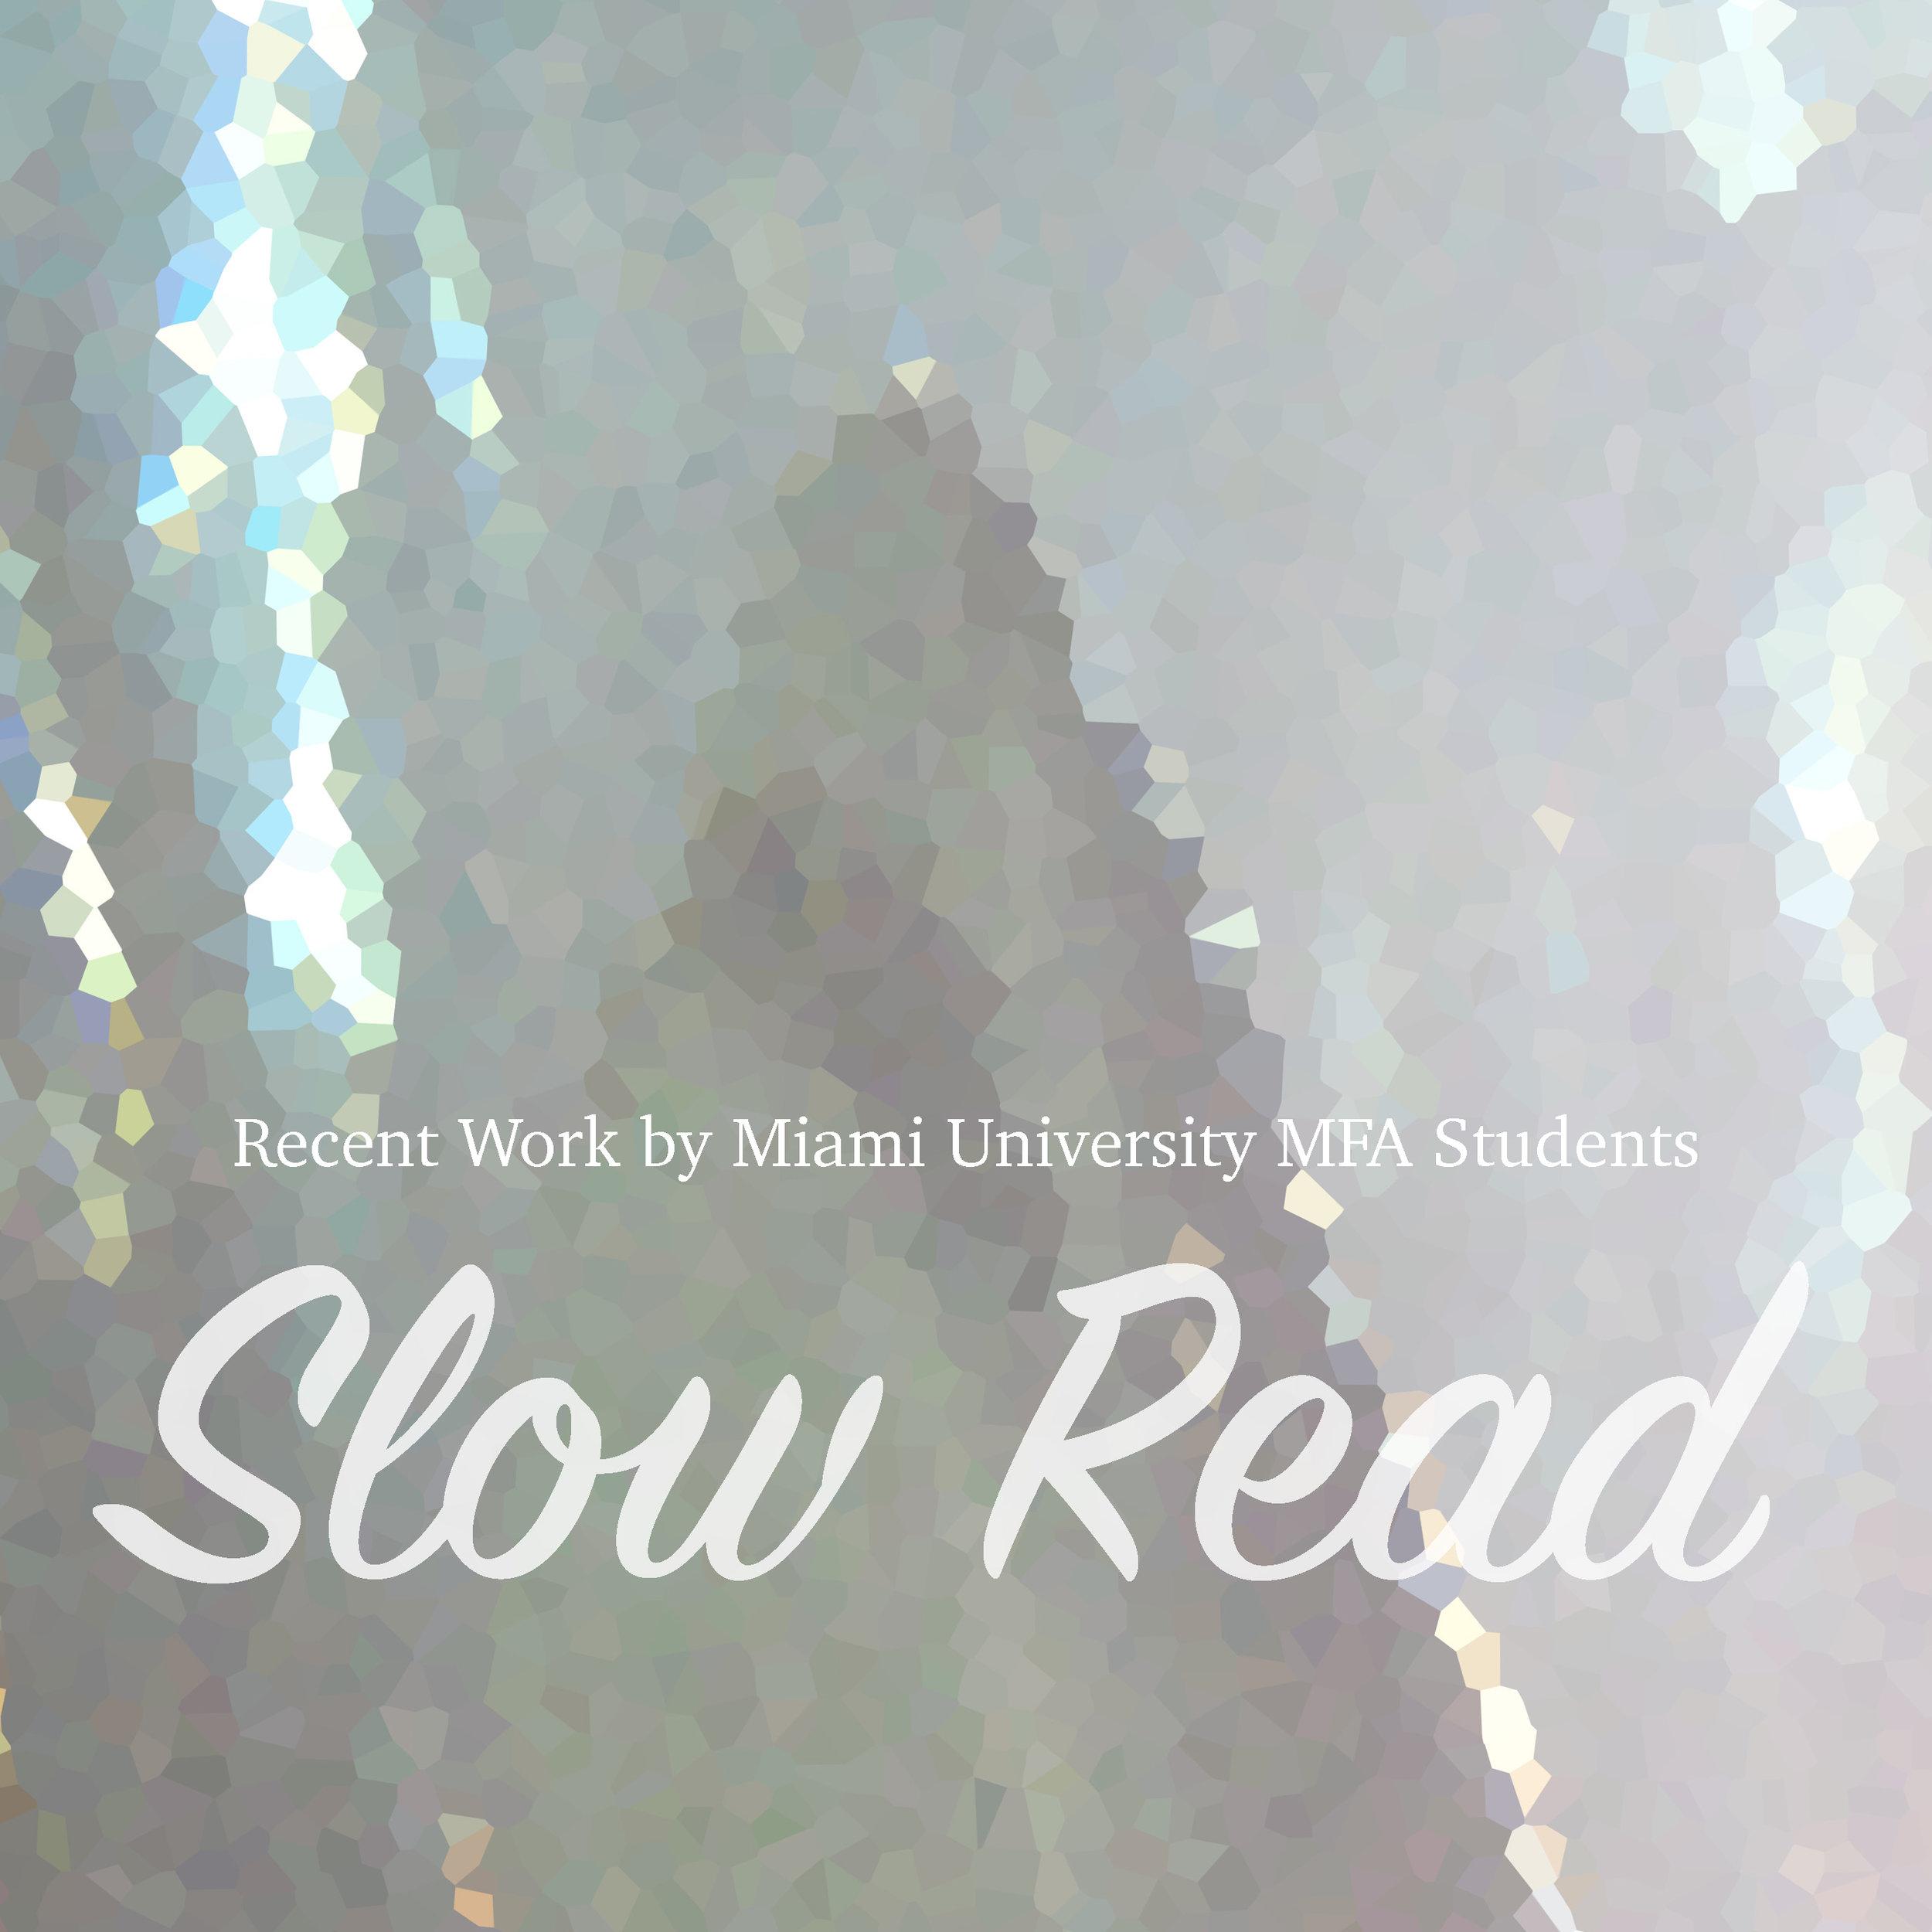 Slow Read  Recent Work by Miami University MFA Students  July 26, 2013 - September 2013  Venue 222  Cincinnati, Ohio 45202